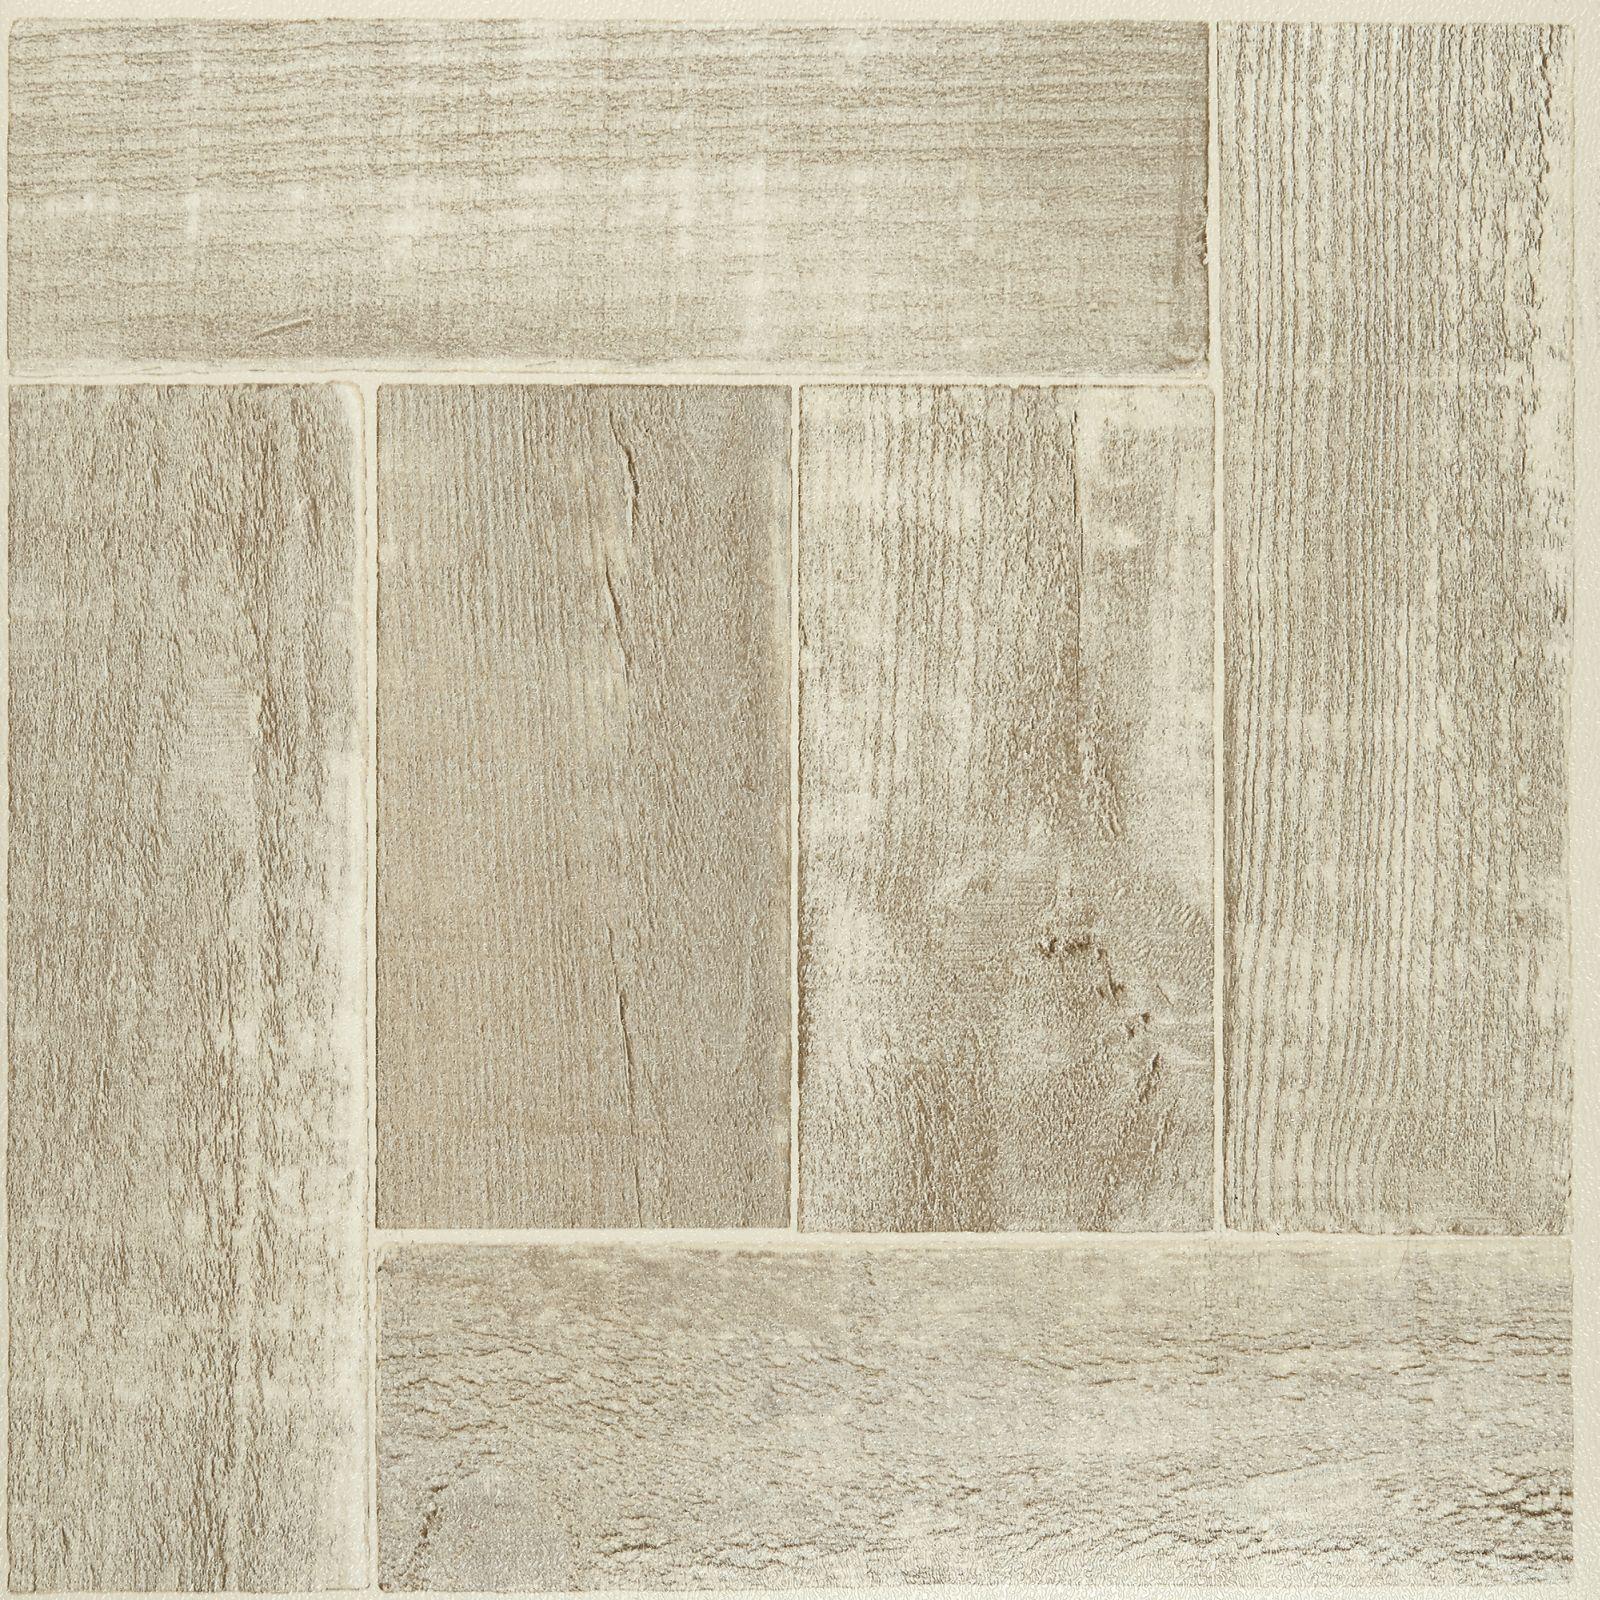 Achim nexus saddlewood 12x12 self adhesive vinyl floor tile 20 achim nexus saddlewood 12x12 self adhesive vinyl floor tile 20 tiles20 sq ft dailygadgetfo Image collections